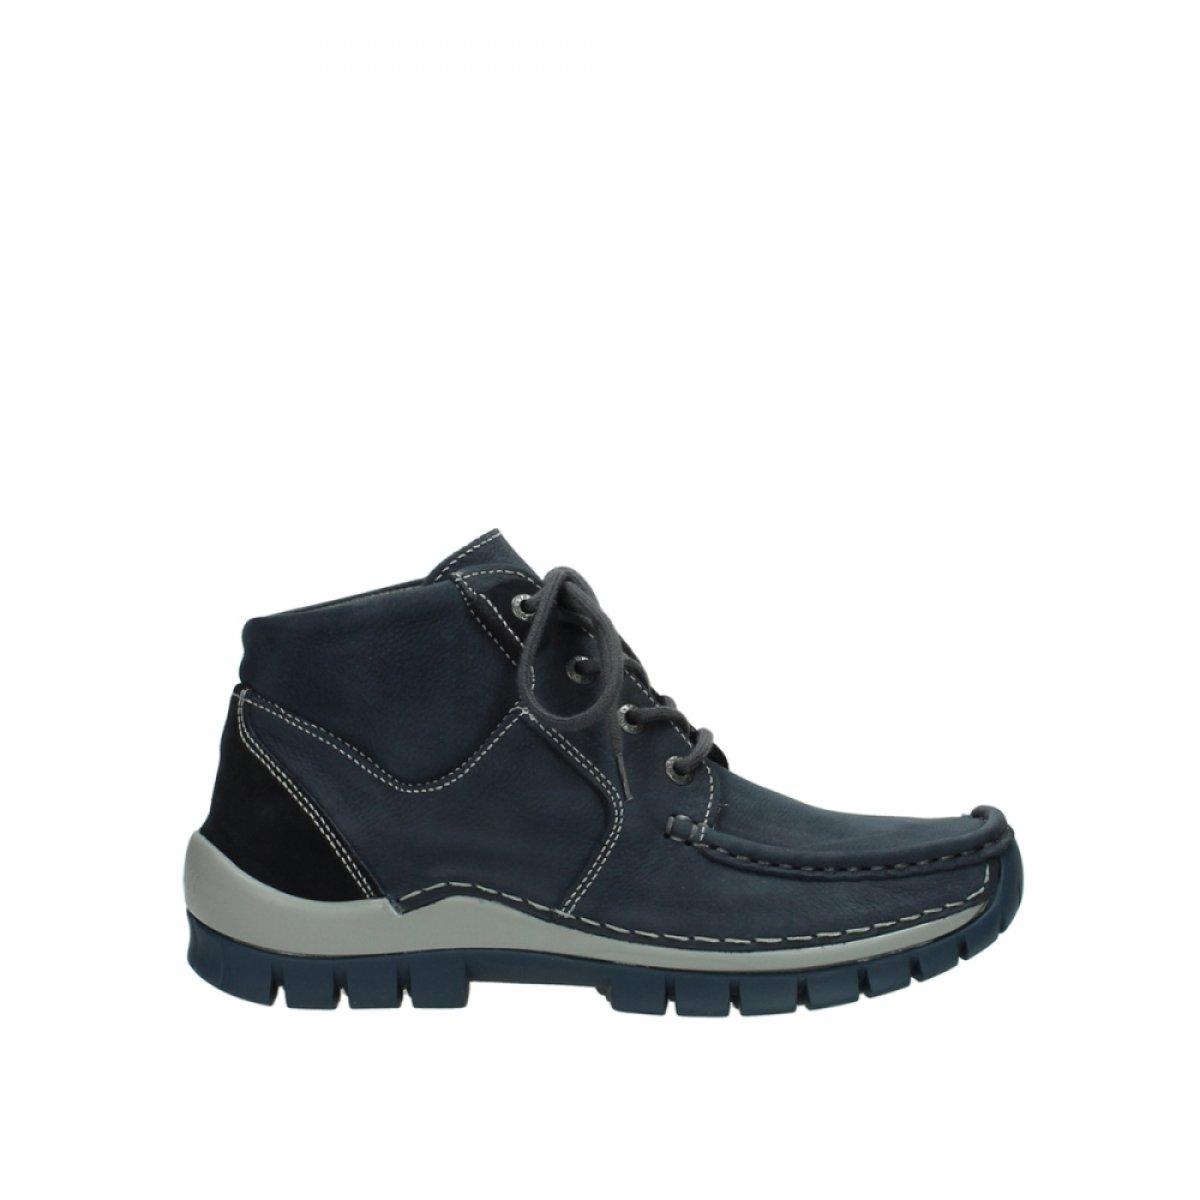 Wolky 0473511802 - Zapatos de cordones para mujer 37 EU|Azul